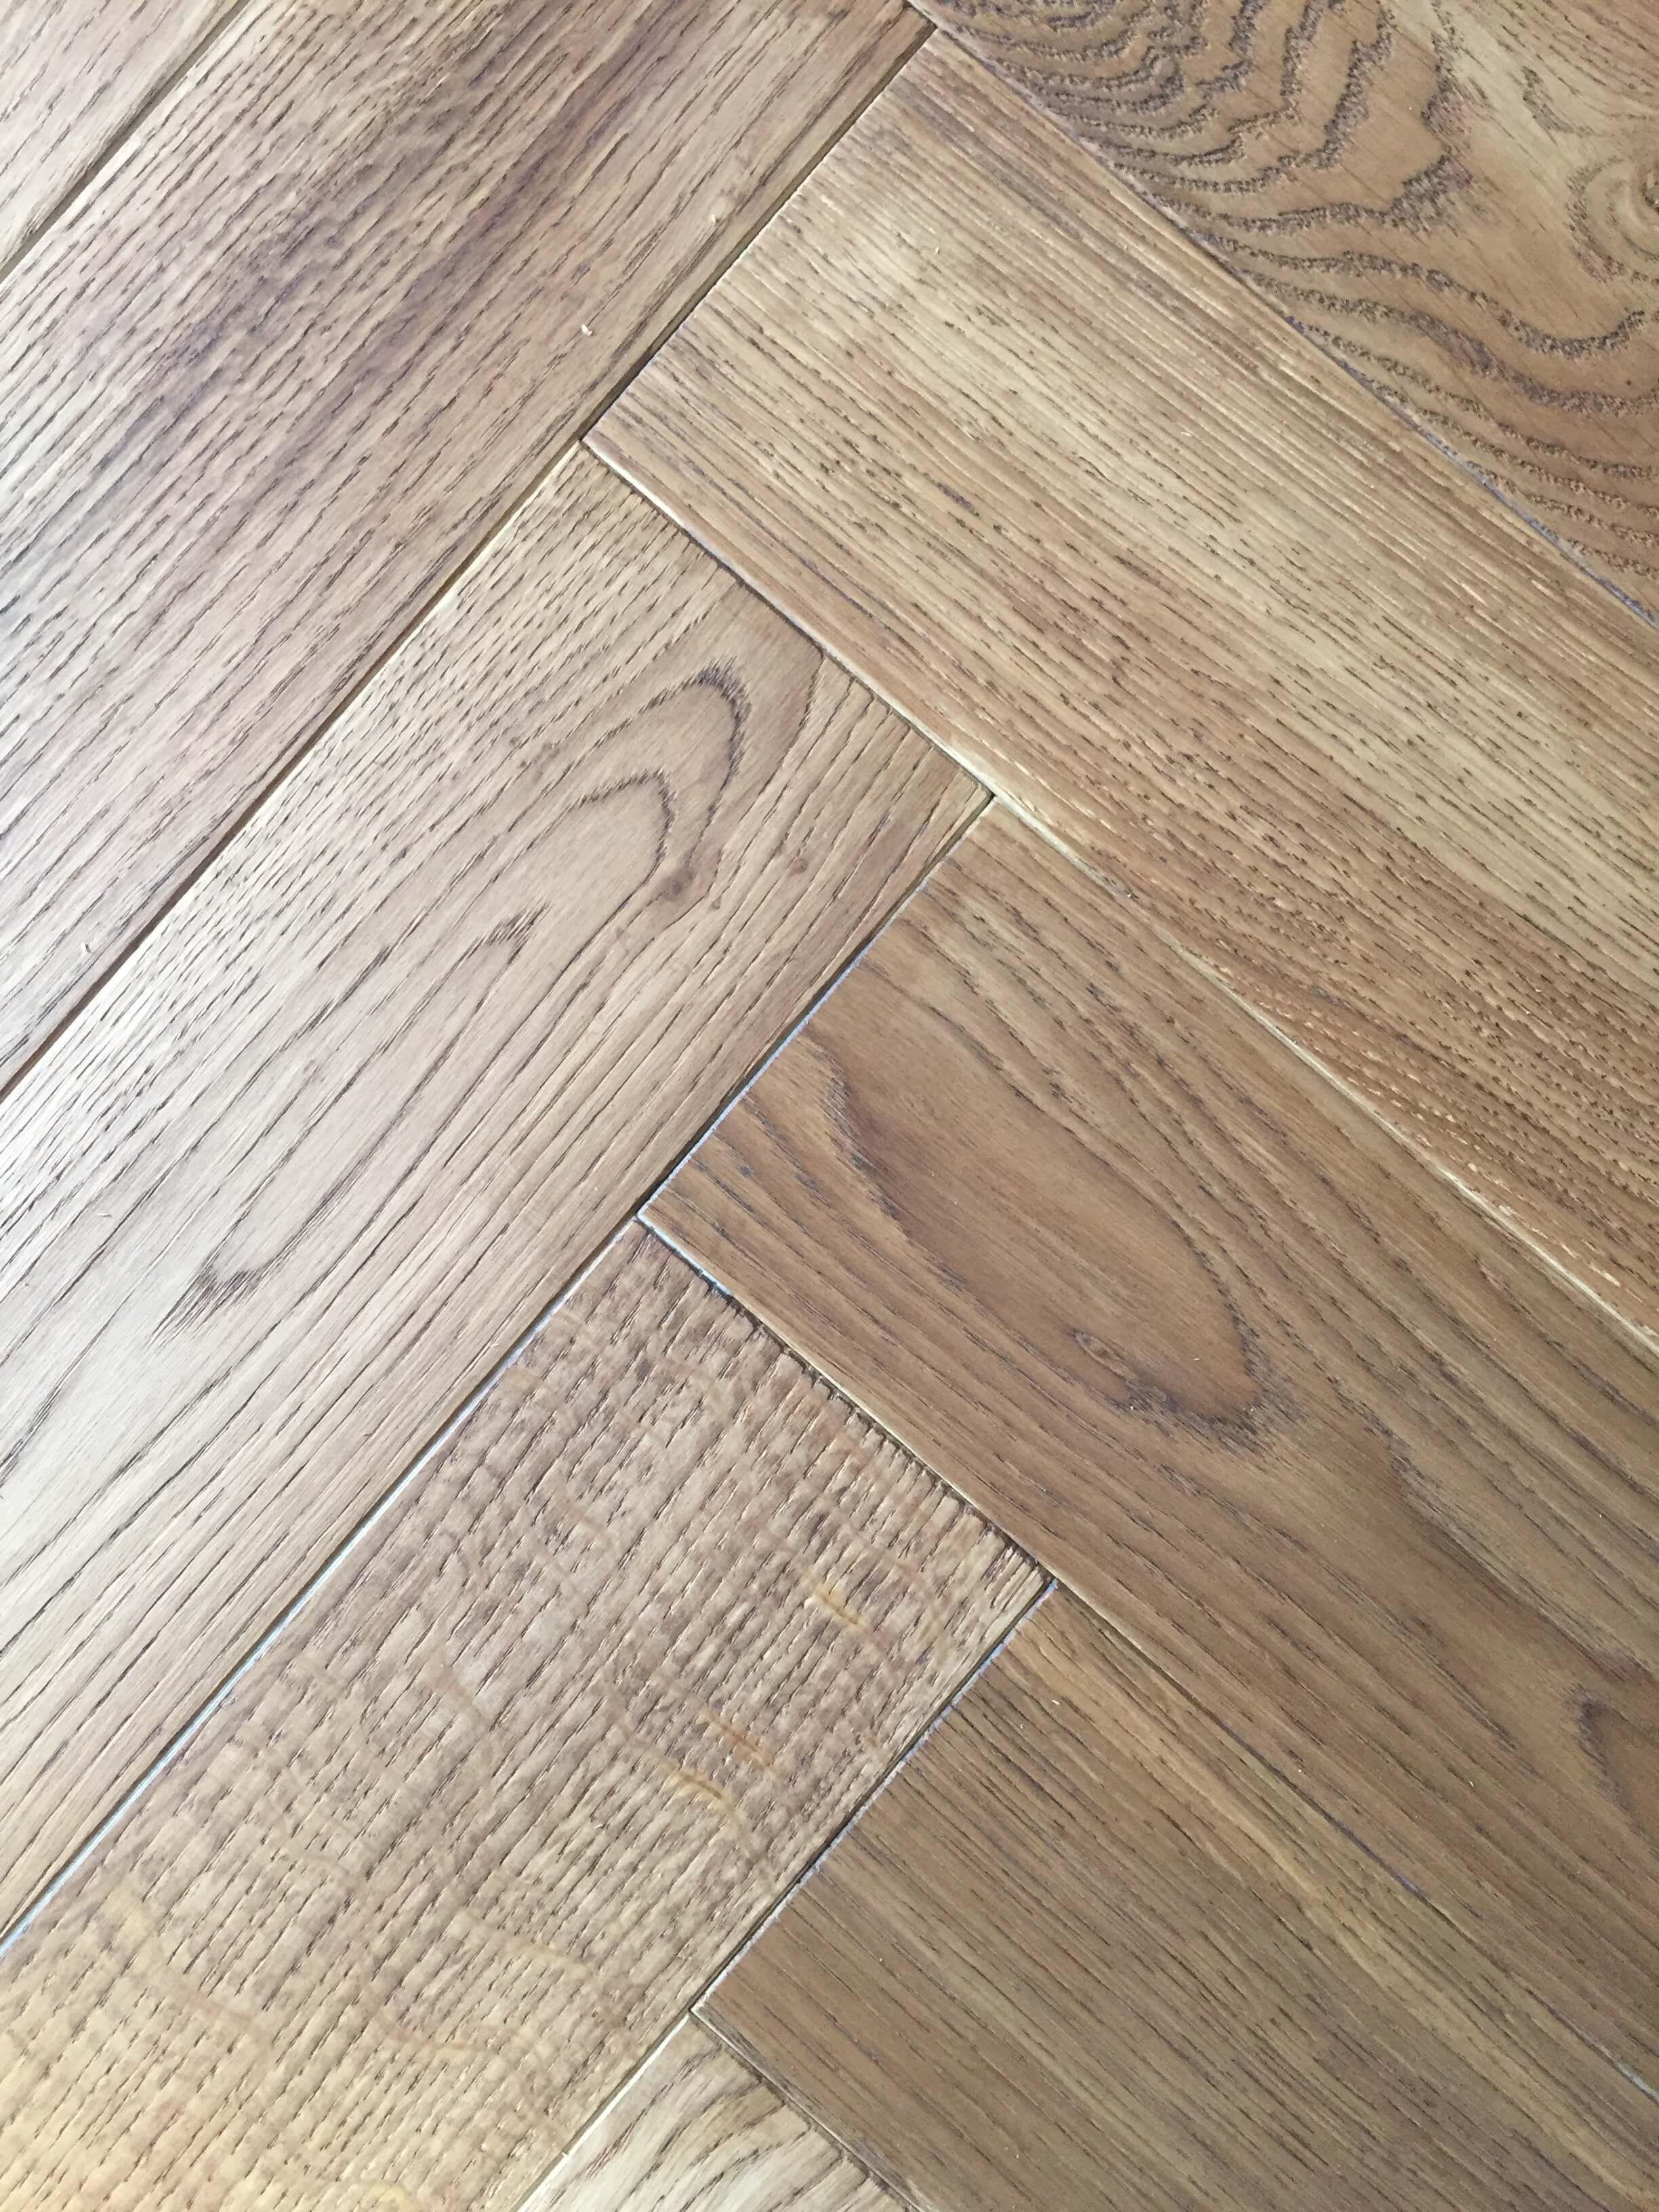 restaining hardwood floors darker without sanding of hardwood floor repair 50 inspirational sanding and refinishing in hardwood floor repair new decorating an open floor plan living room awesome design plan 0d